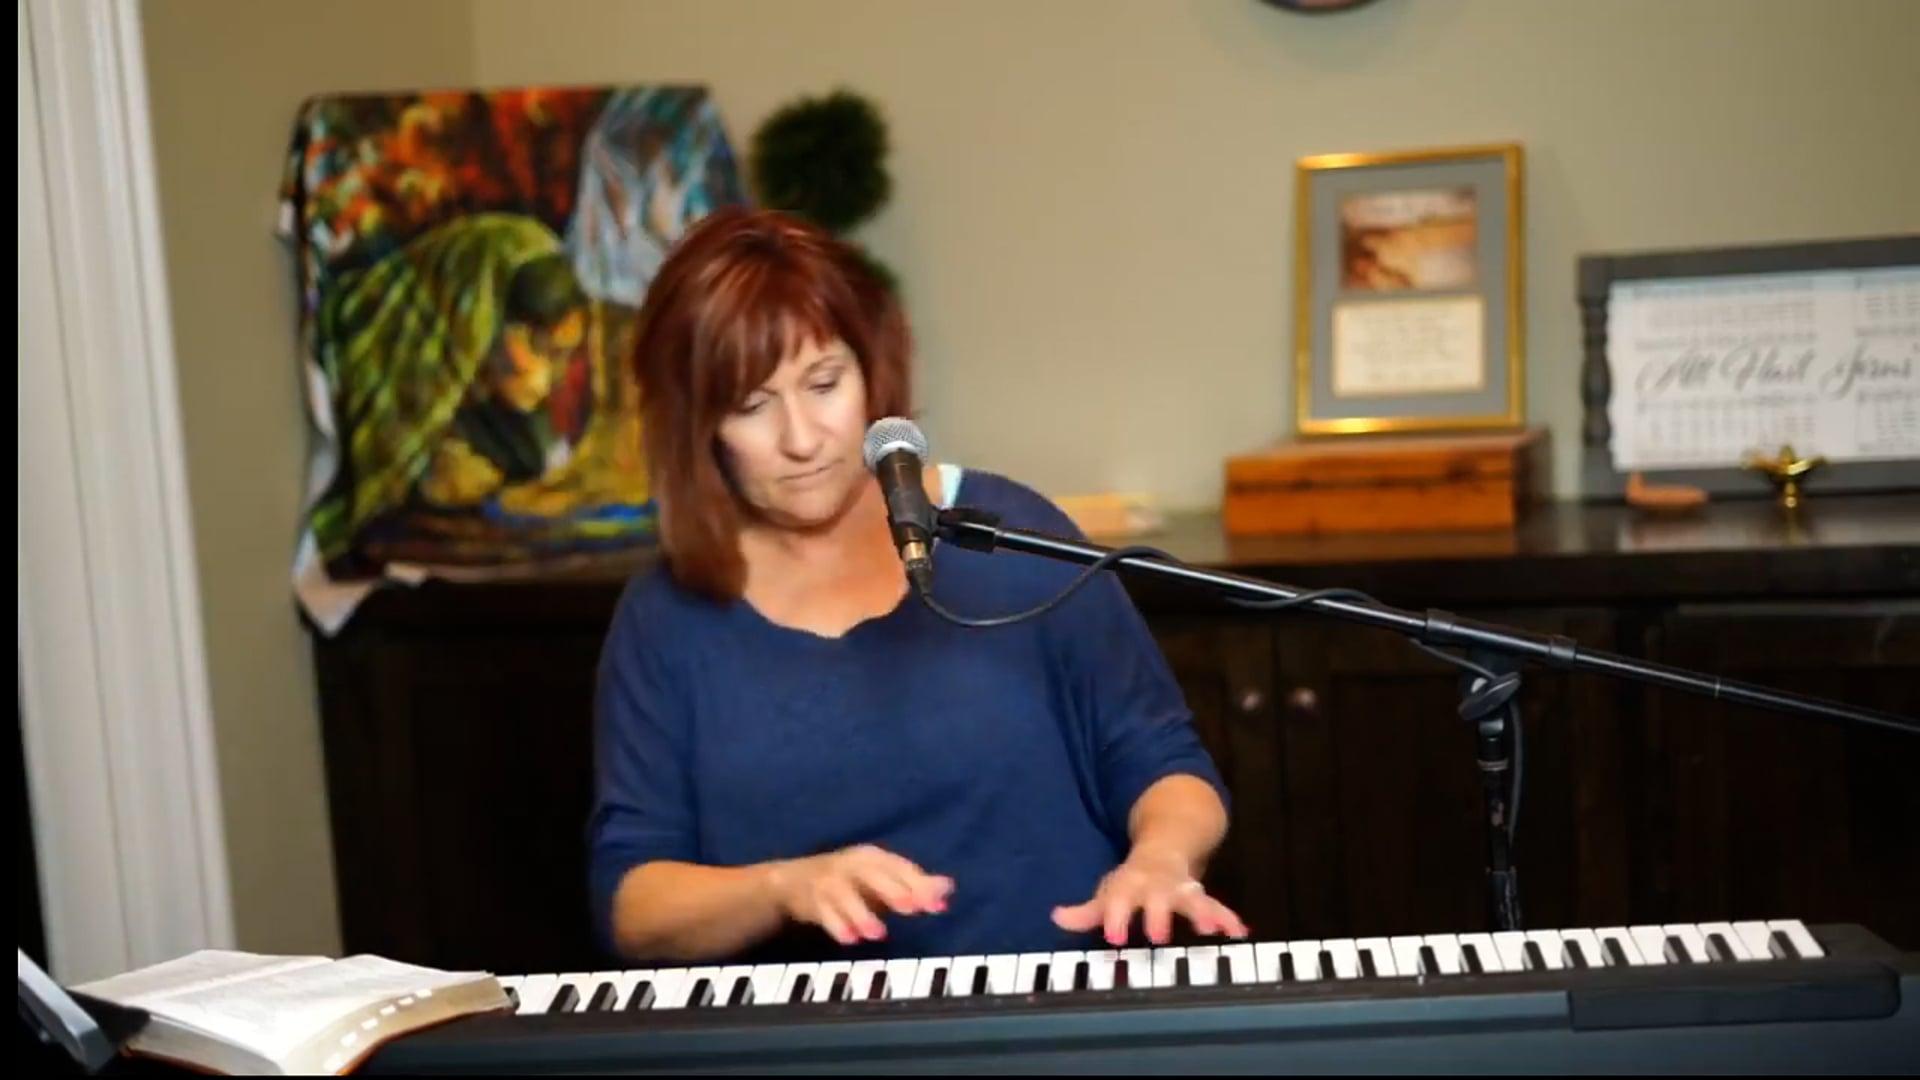 Julie Meyer Sings of God's Protection...